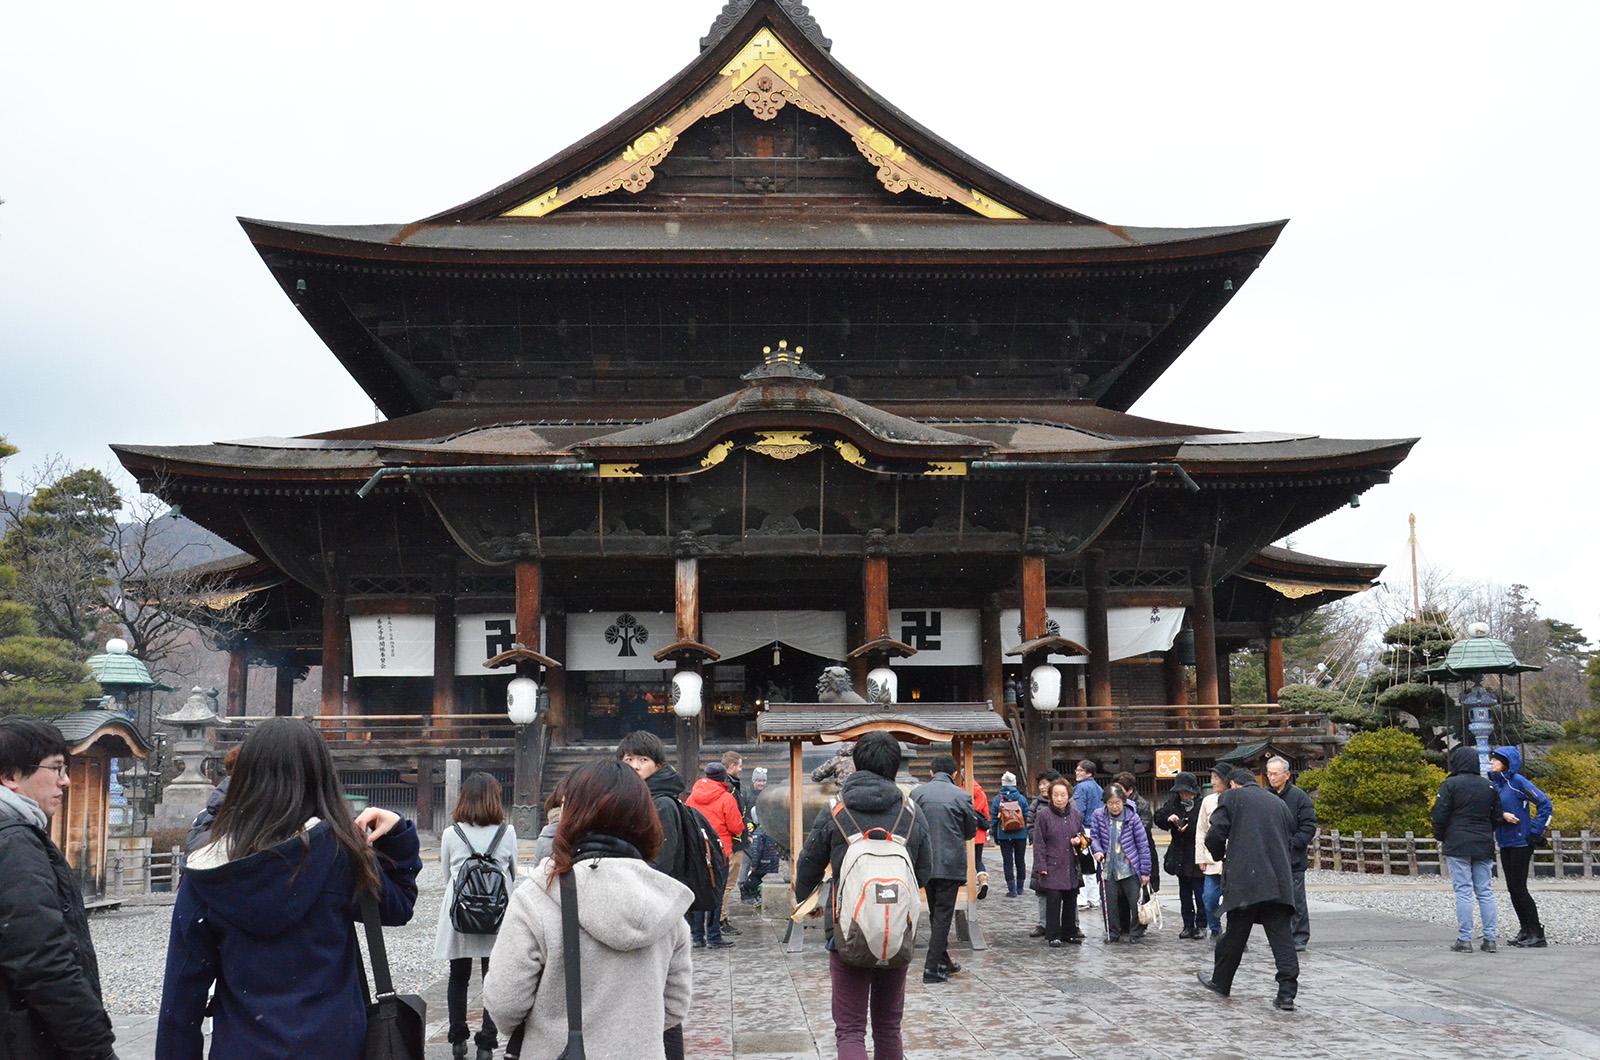 【SCGの地方創生】企業見学ツアー@長野!地元の優良企業と学生をつなぐ就職支援のカタチ